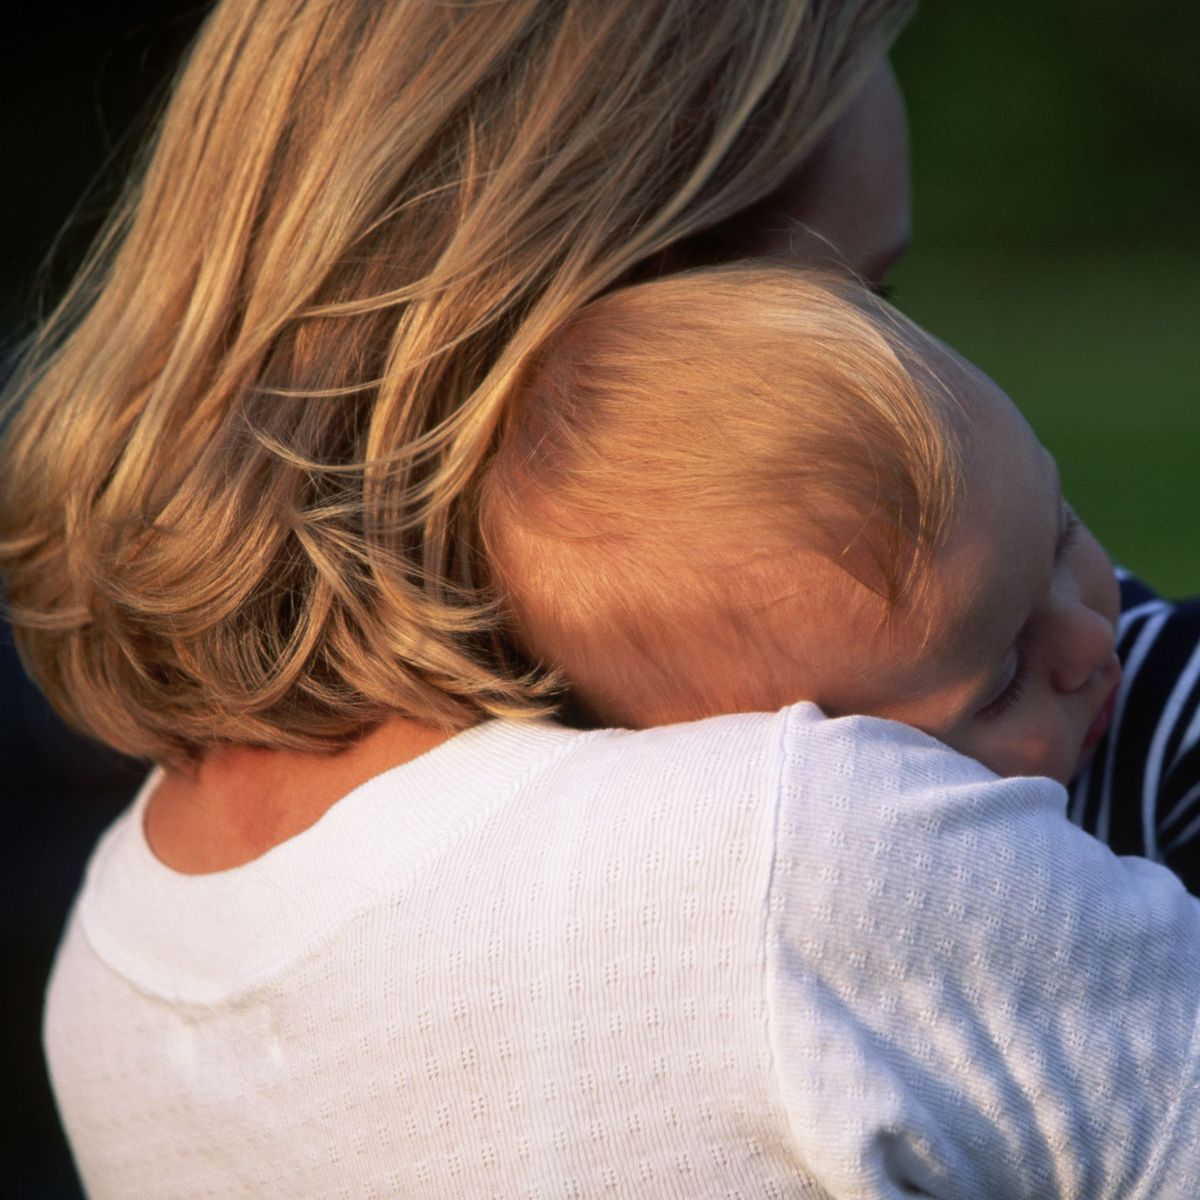 2 pruebas negativ trotzdem schwangerschaftsdiabetes